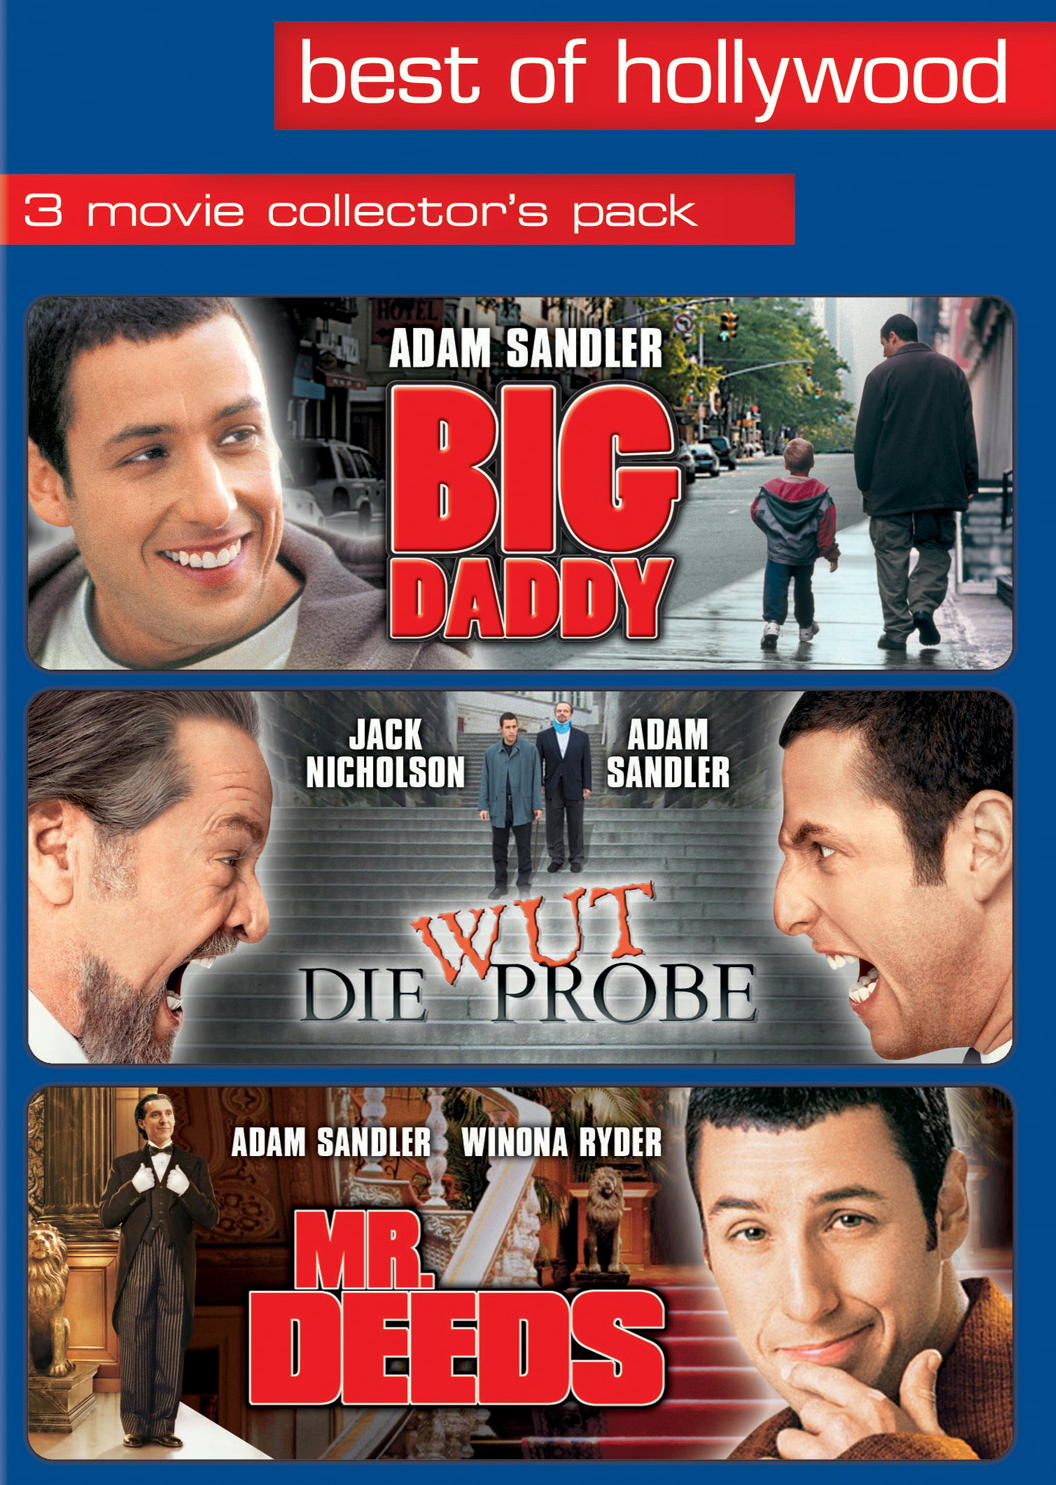 Best of Hollywood - 3 Movie Collector's Pack: Big Daddy / Die Wutprobe / Mr. Deeds (3 DVDs) Poster